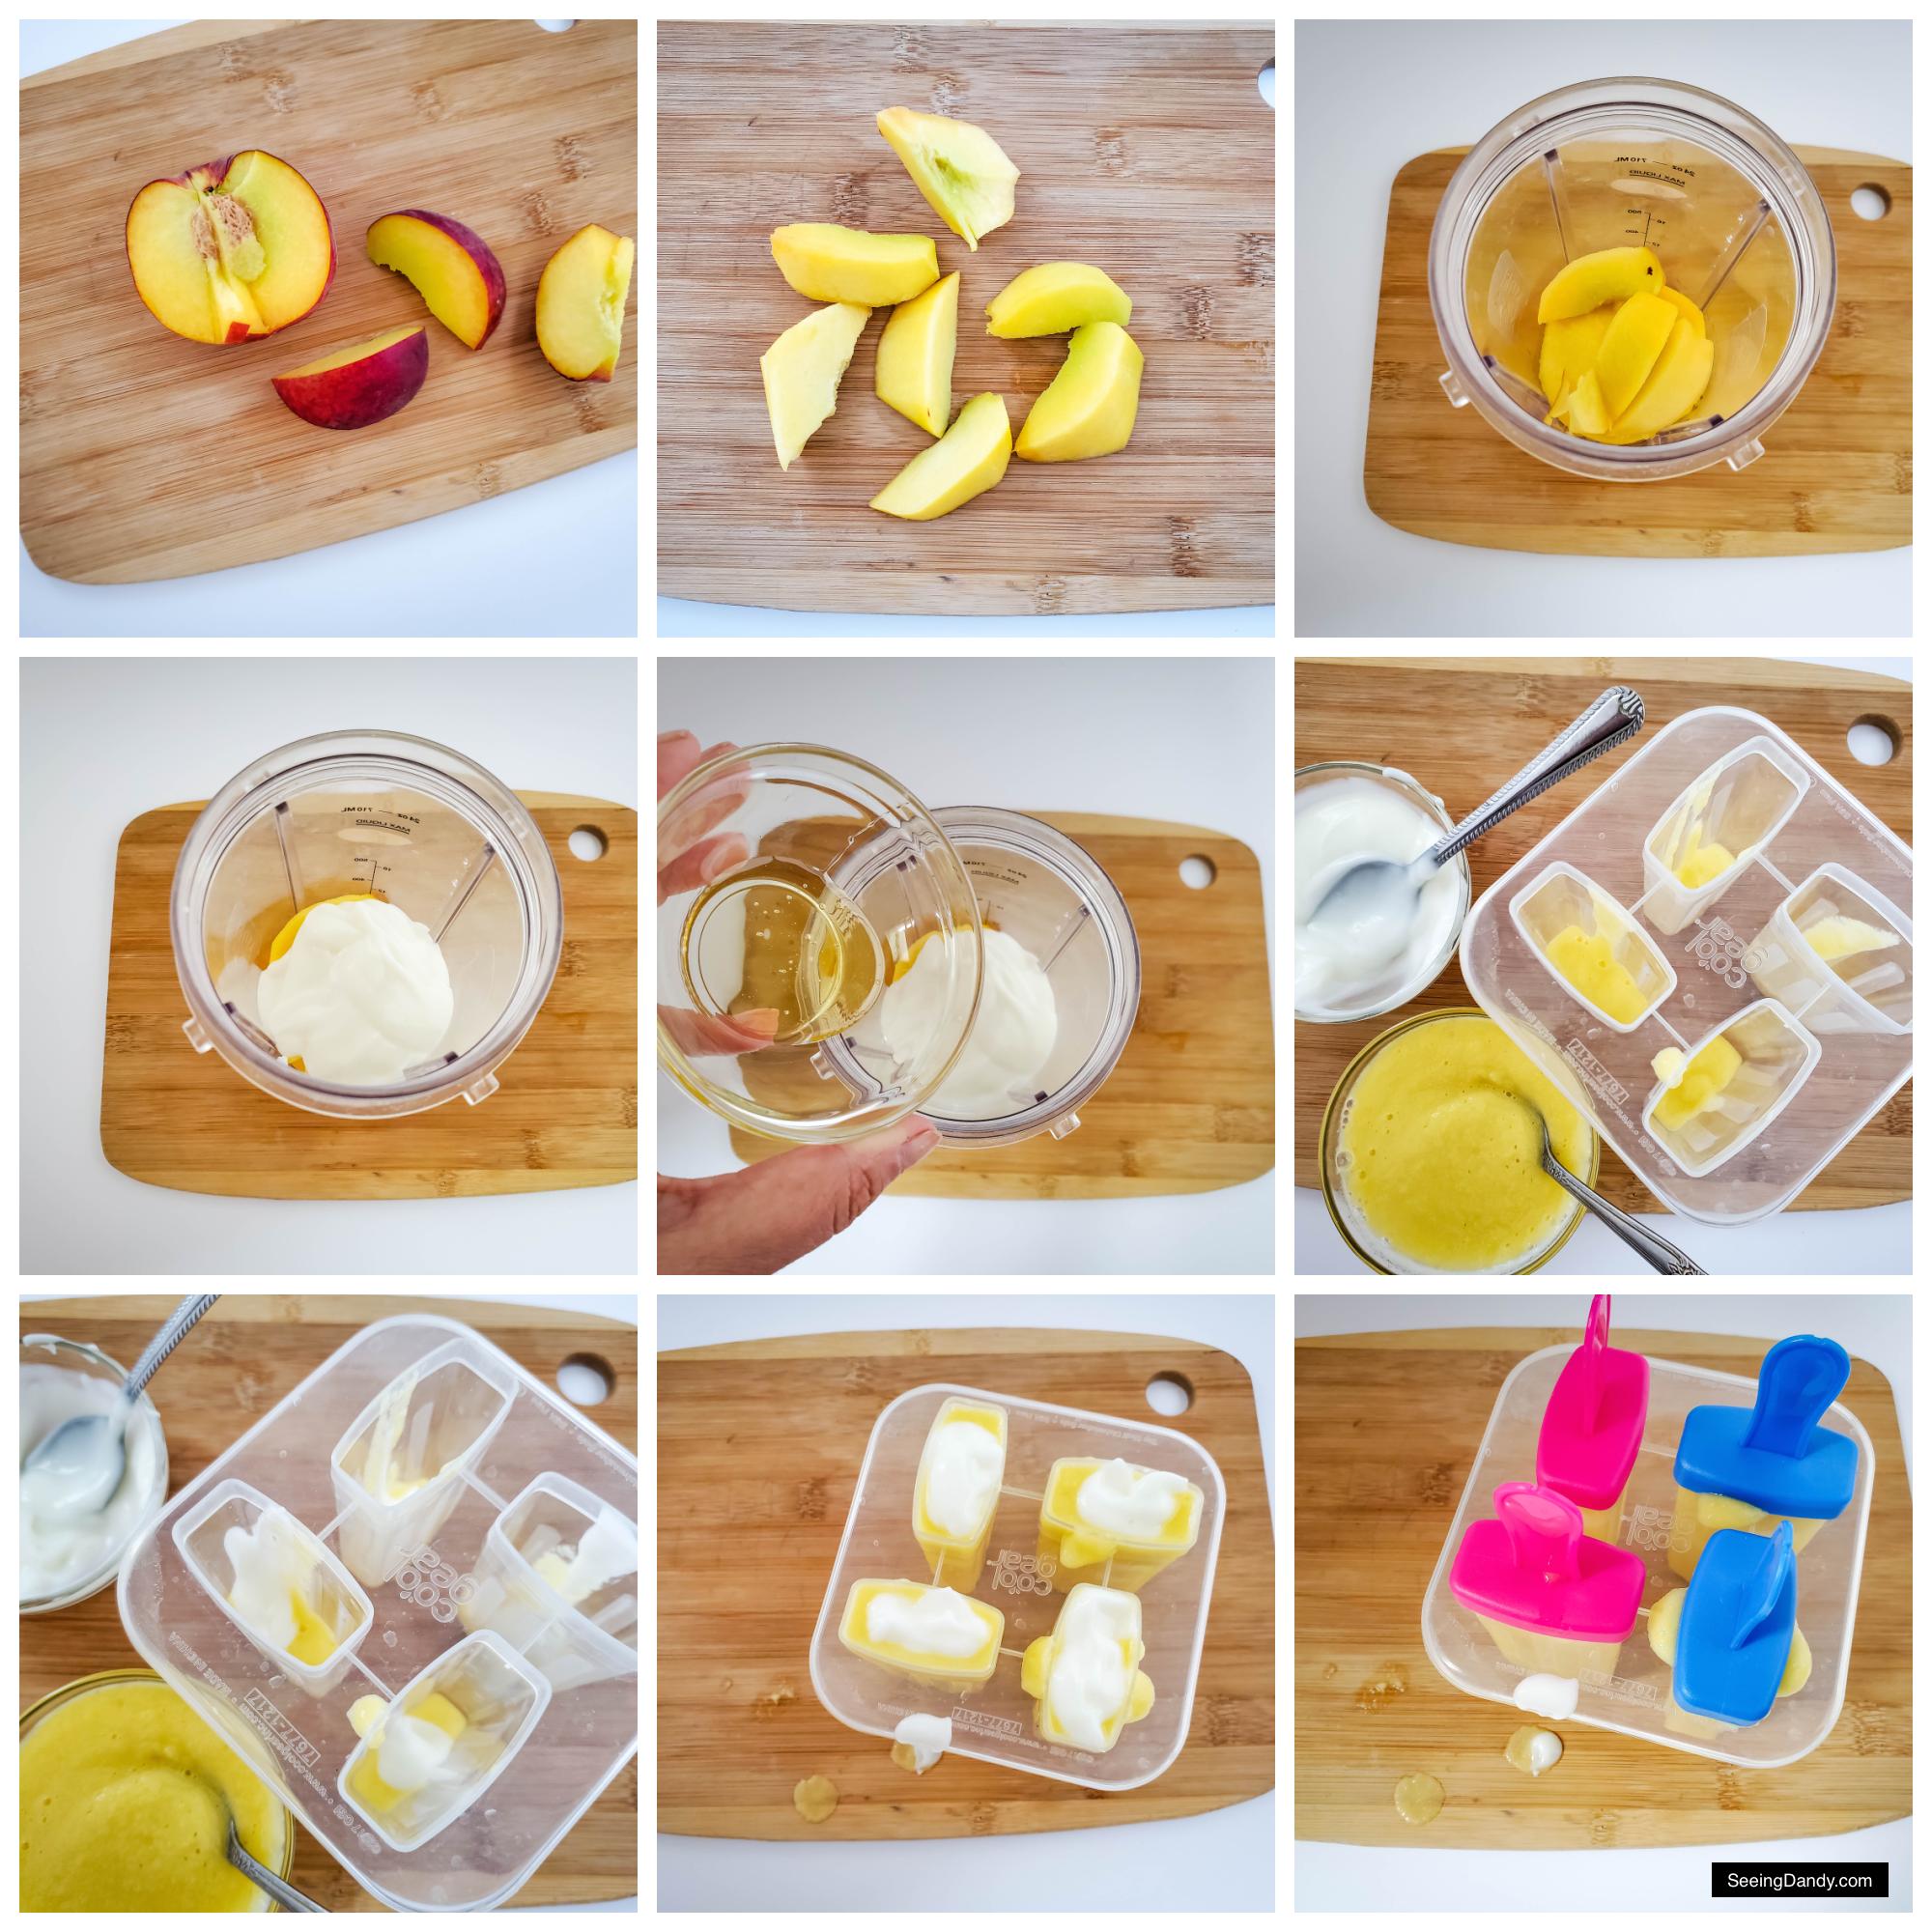 easy recipes, peaches and cream, peach ice cream recipe, popsicle molds, popsicle stick, fresh peaches, wood cutting board, honey recipe